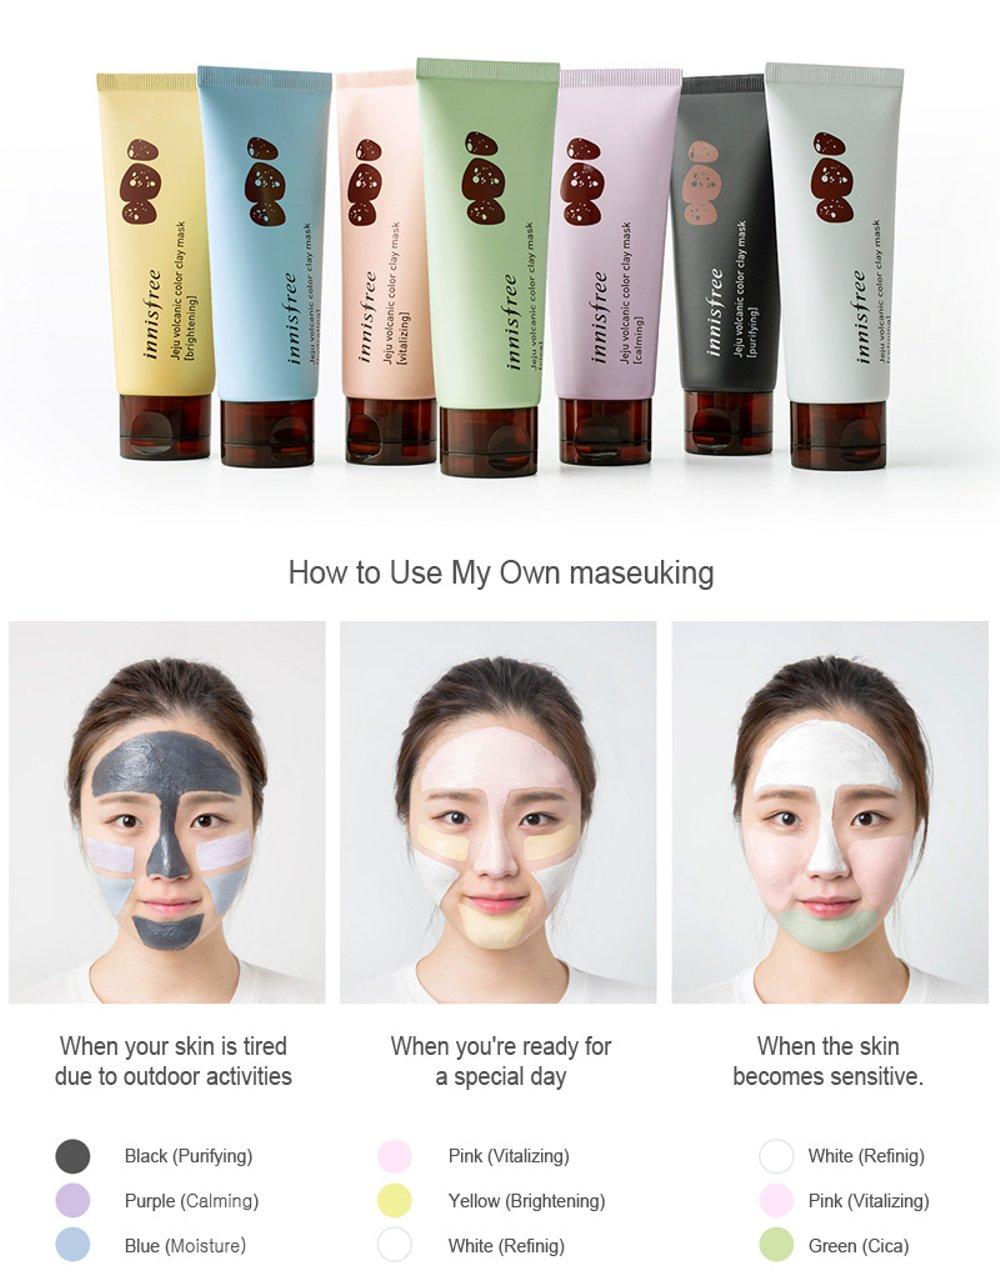 [Innisfree] Mặt nạ đất sét mới Jeju Volcanic Color Clay Mask 70ml